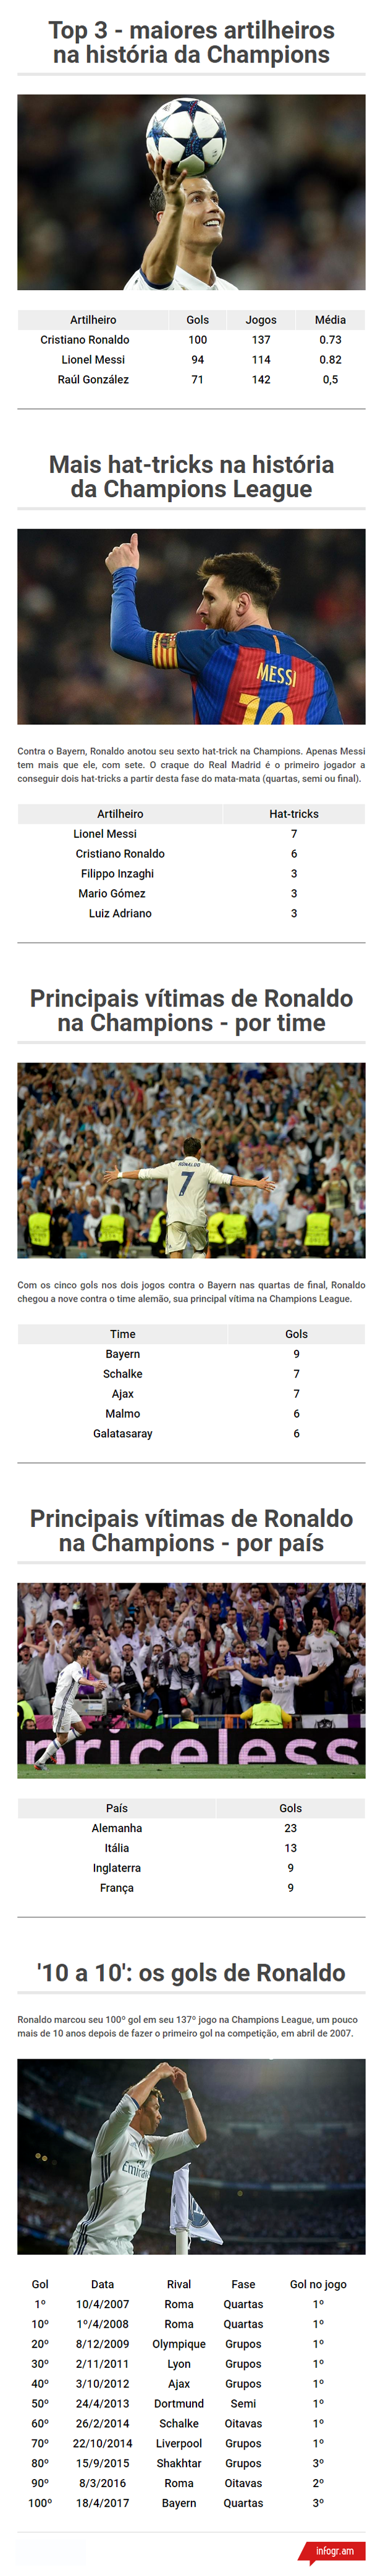 Tabela Cristiano Ronaldo 100 gols Champions League